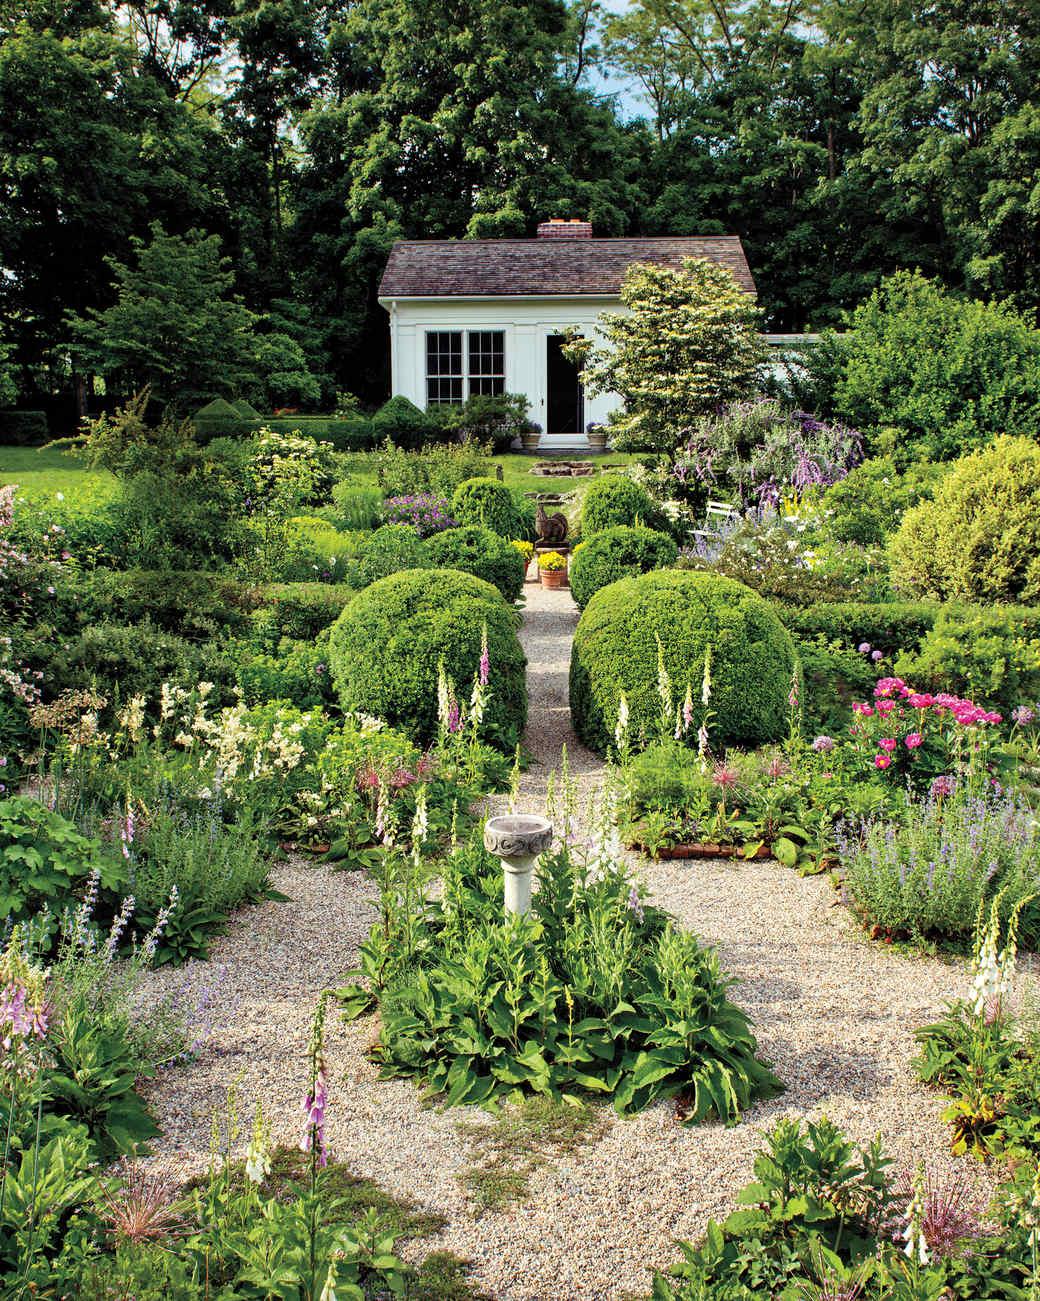 page-dickey-garden-md110307-28.jpg